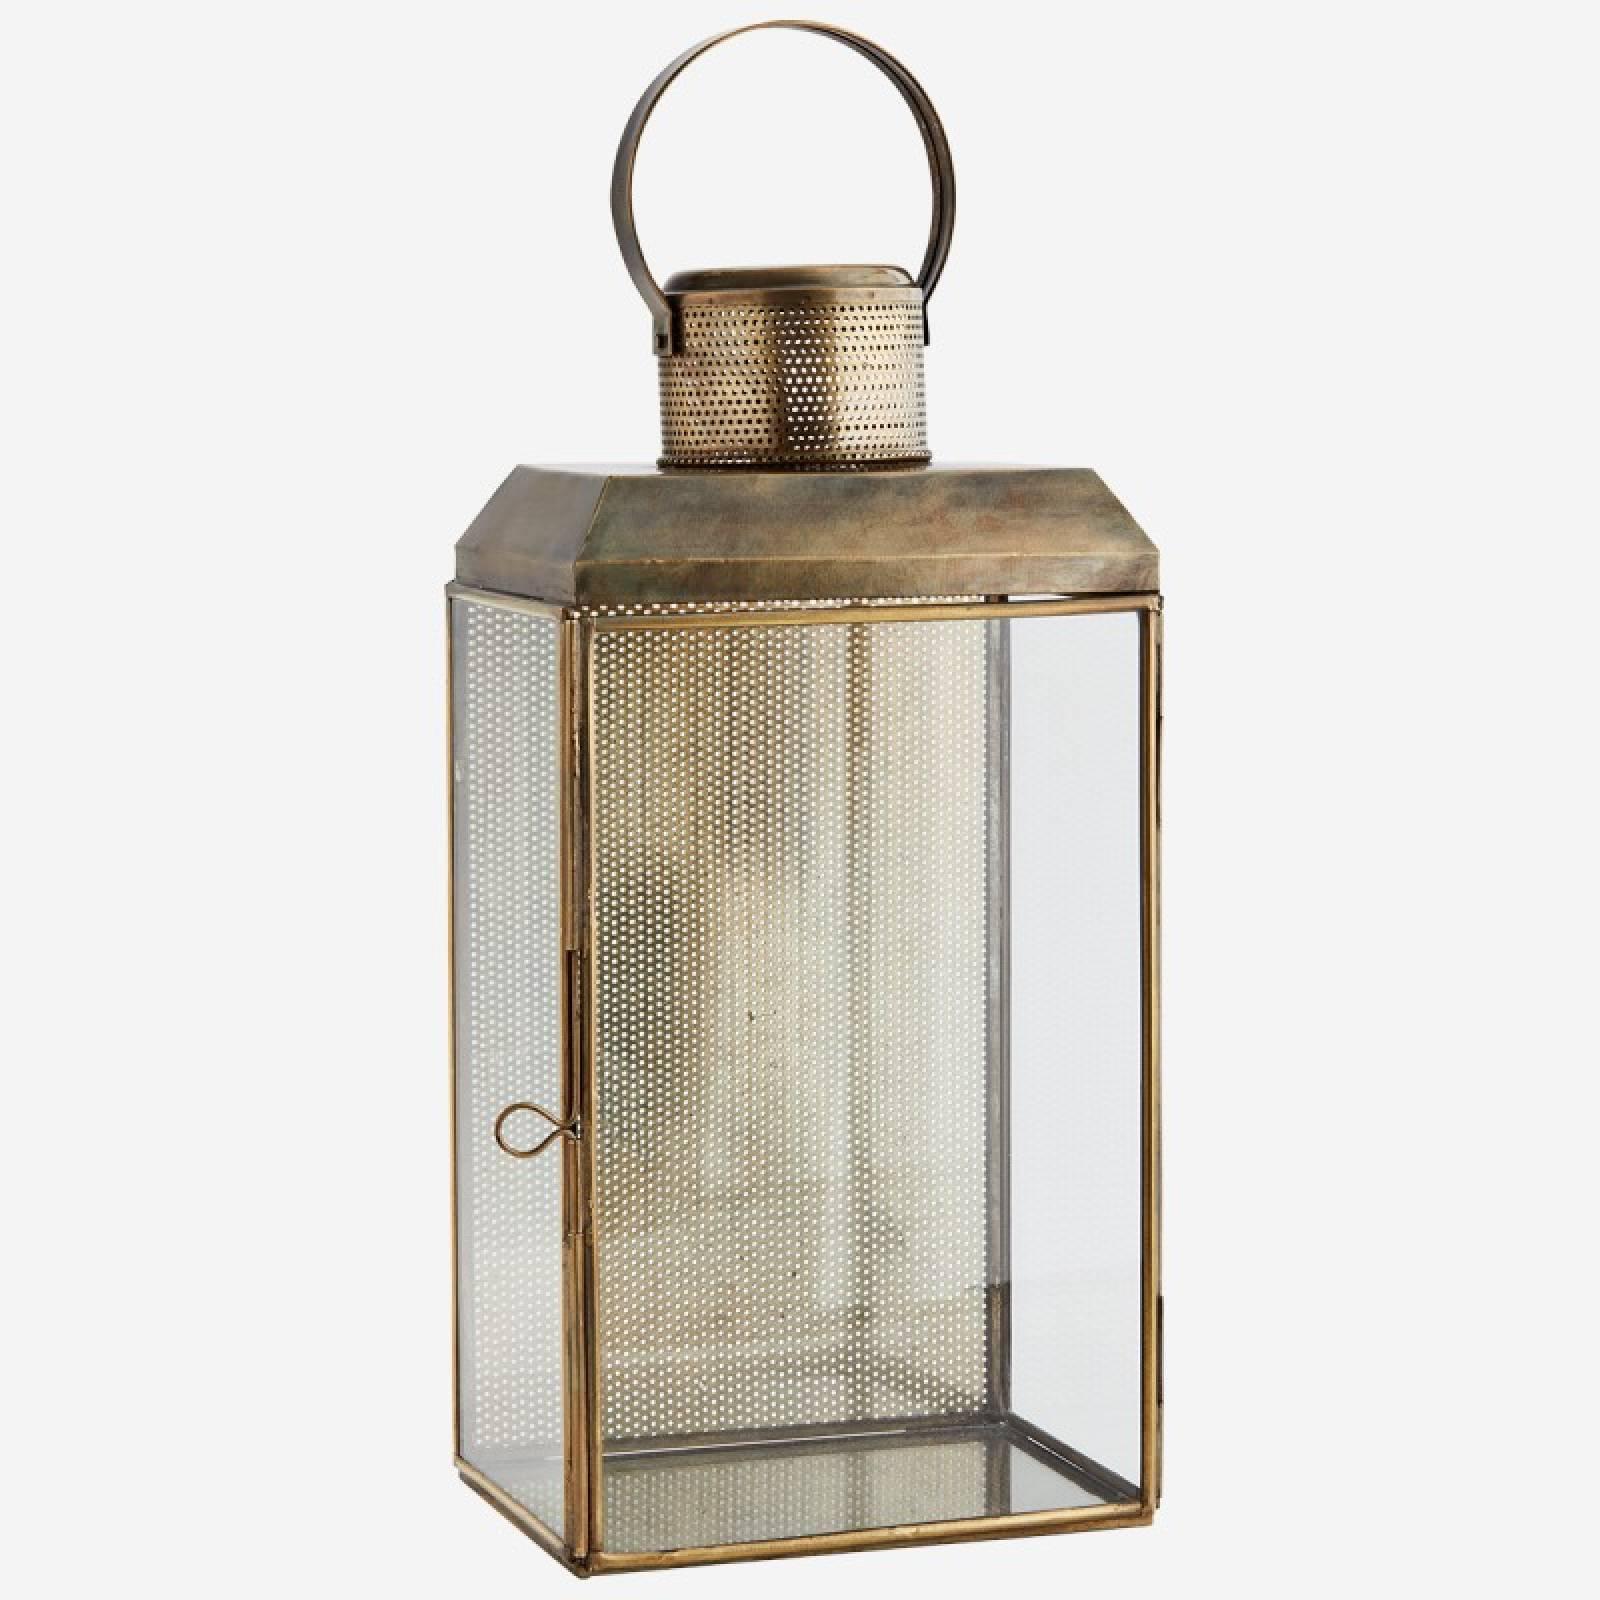 Wall lantern 18x13x36 cm Iron, glass - Aged ant.brass, clear